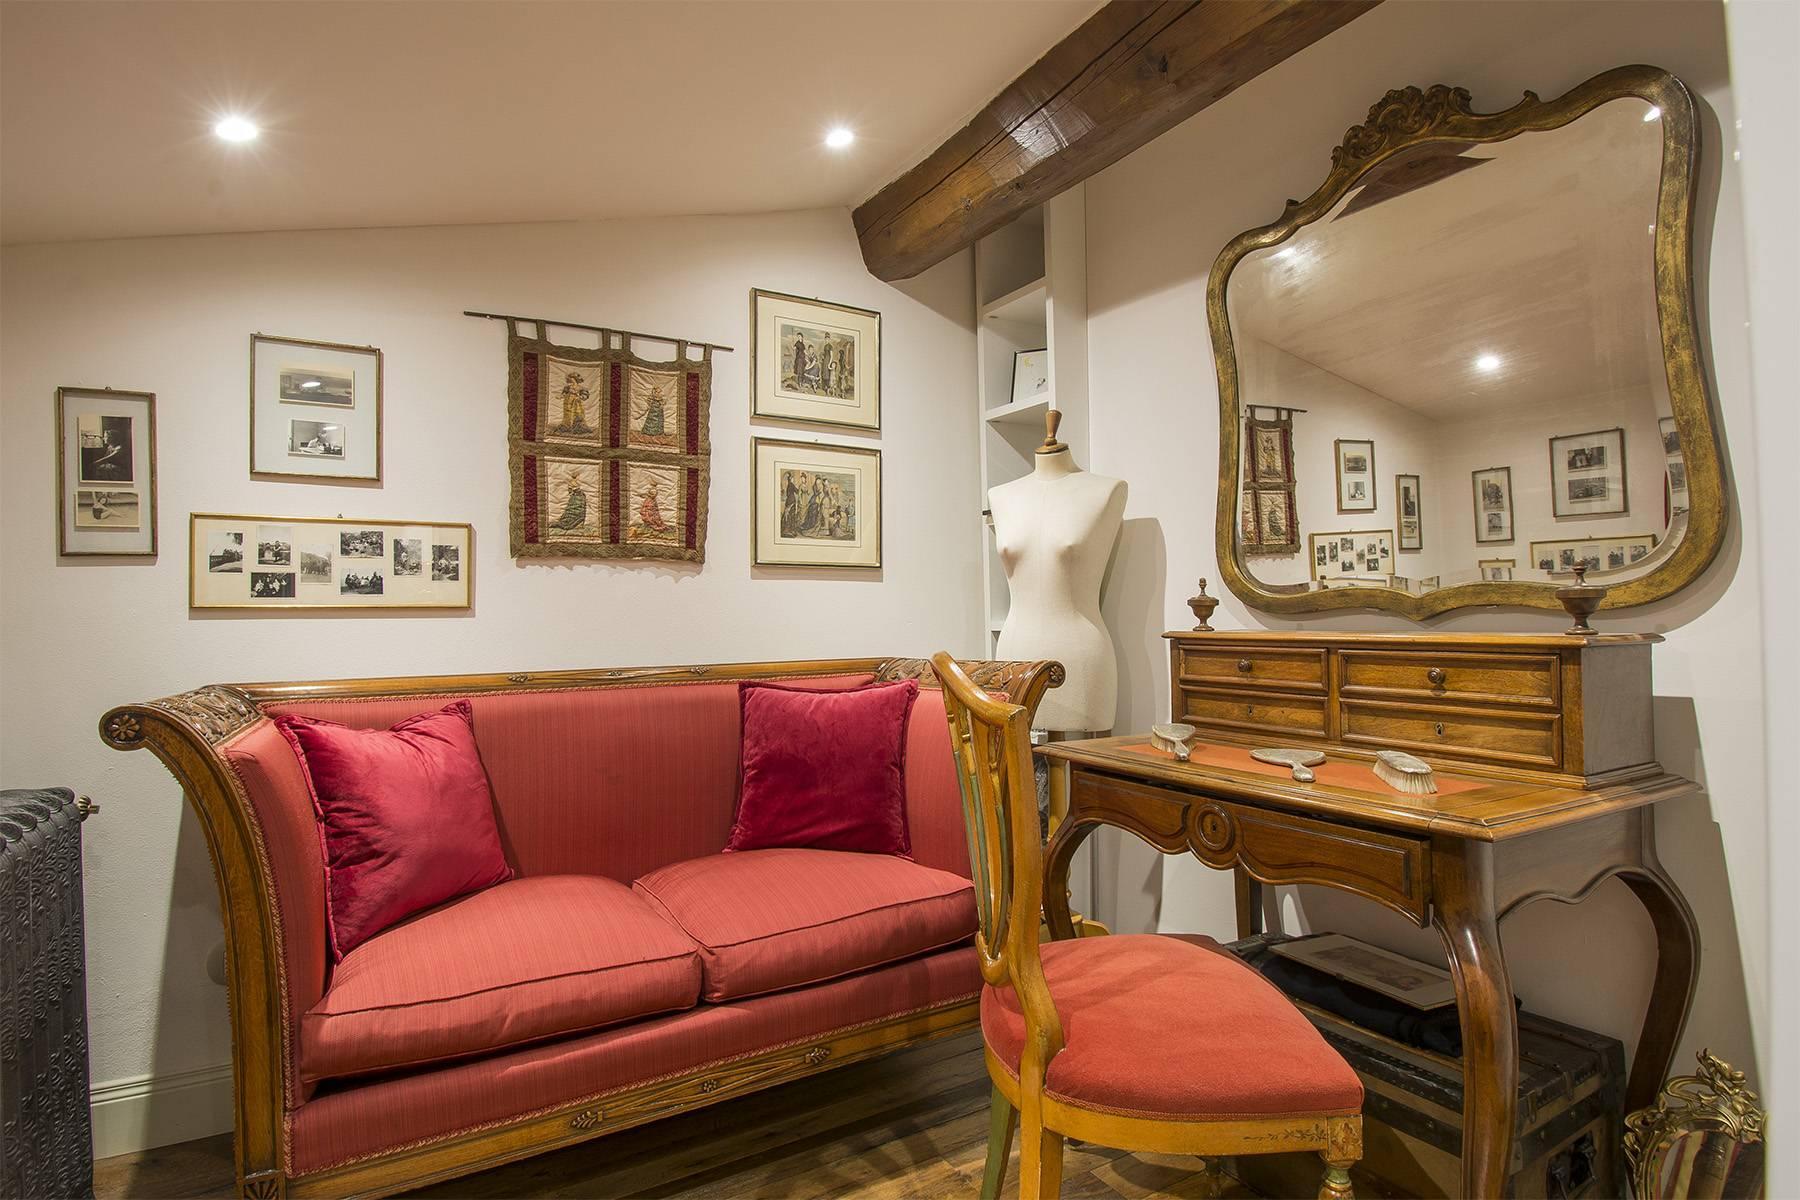 Exquisite apartment within a historic villa - 10